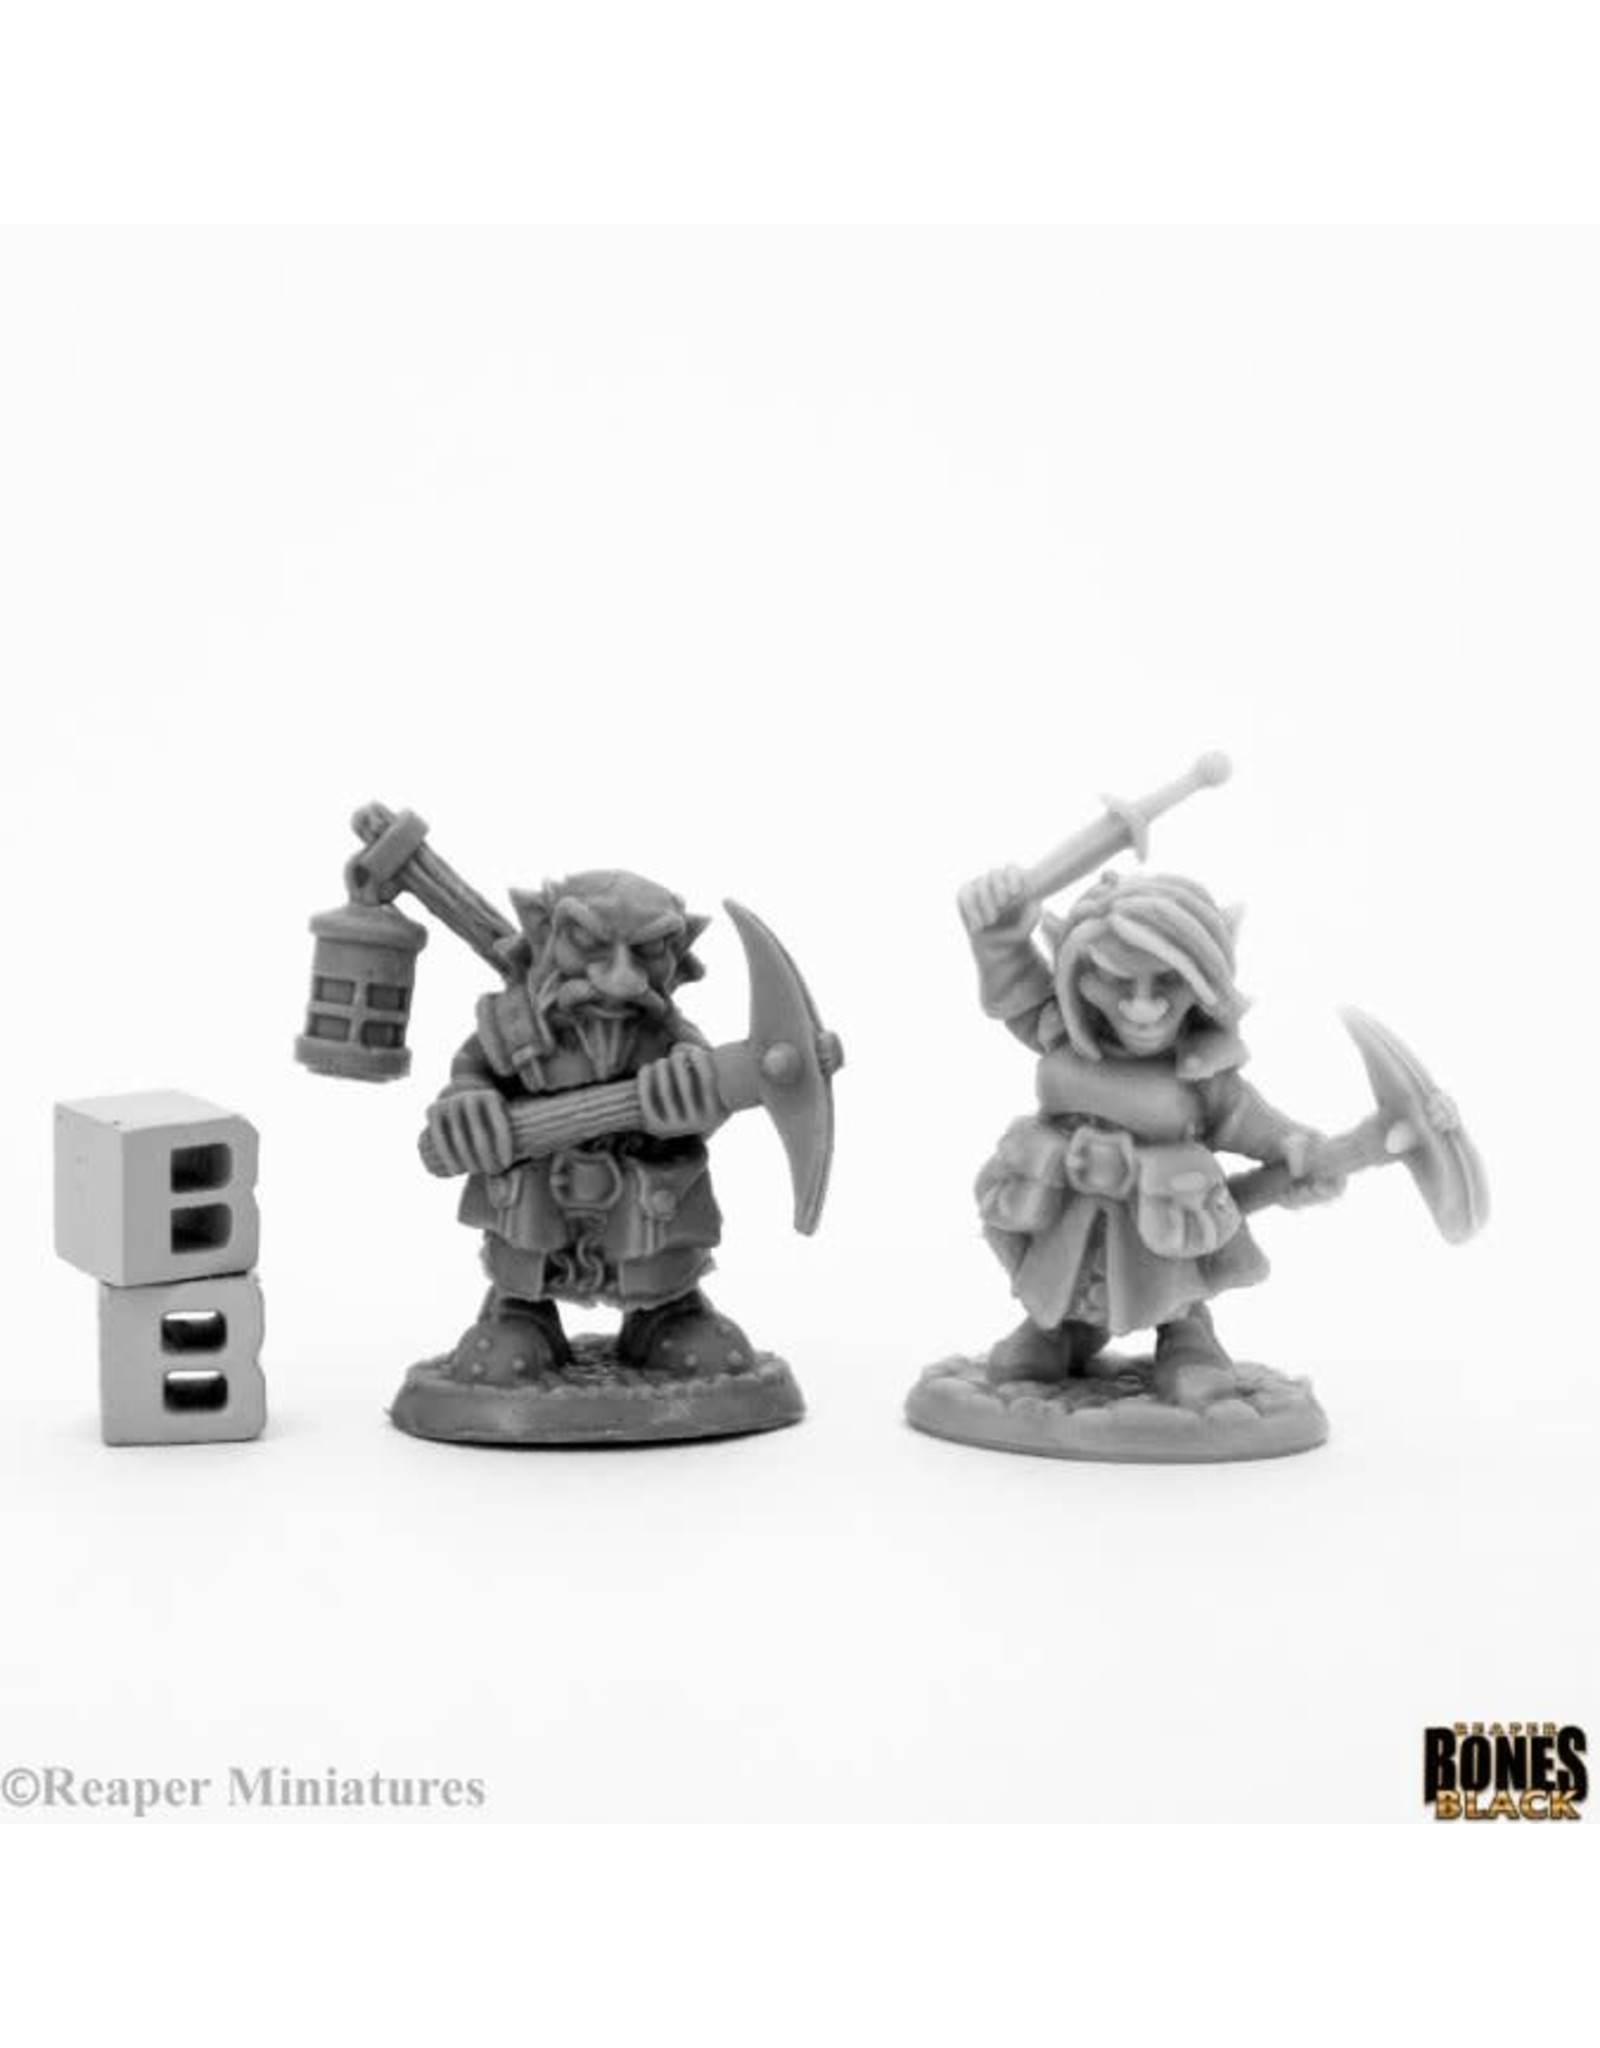 Reaper Miniatures Bones Black: Deep Gnome Heroes